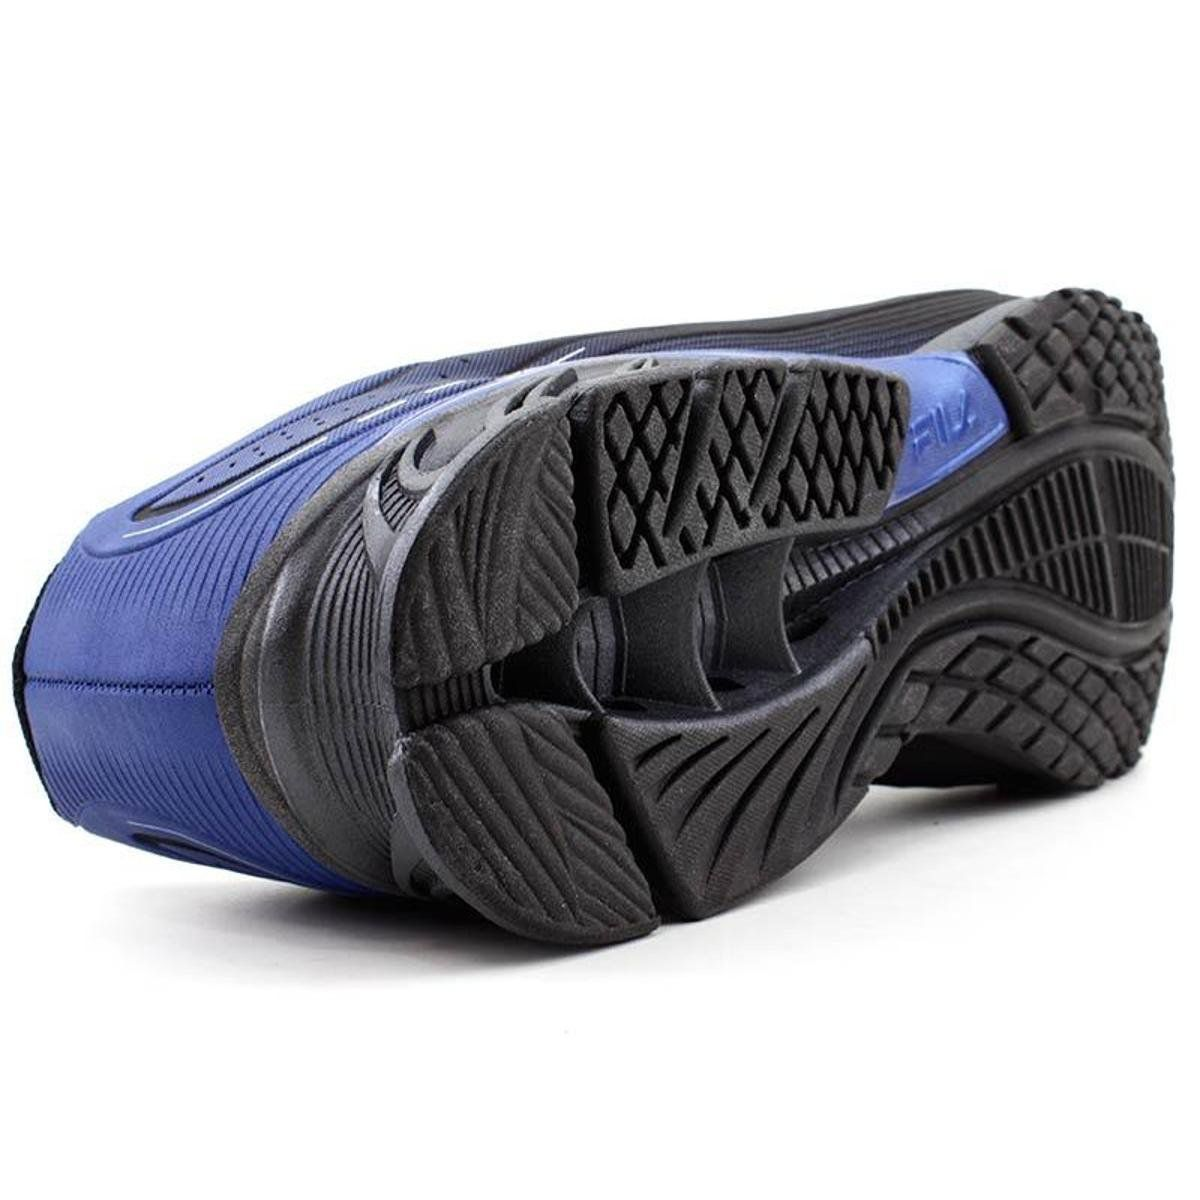 Tenis Masculino Fila Cage Python - Preto/Azul/Prata